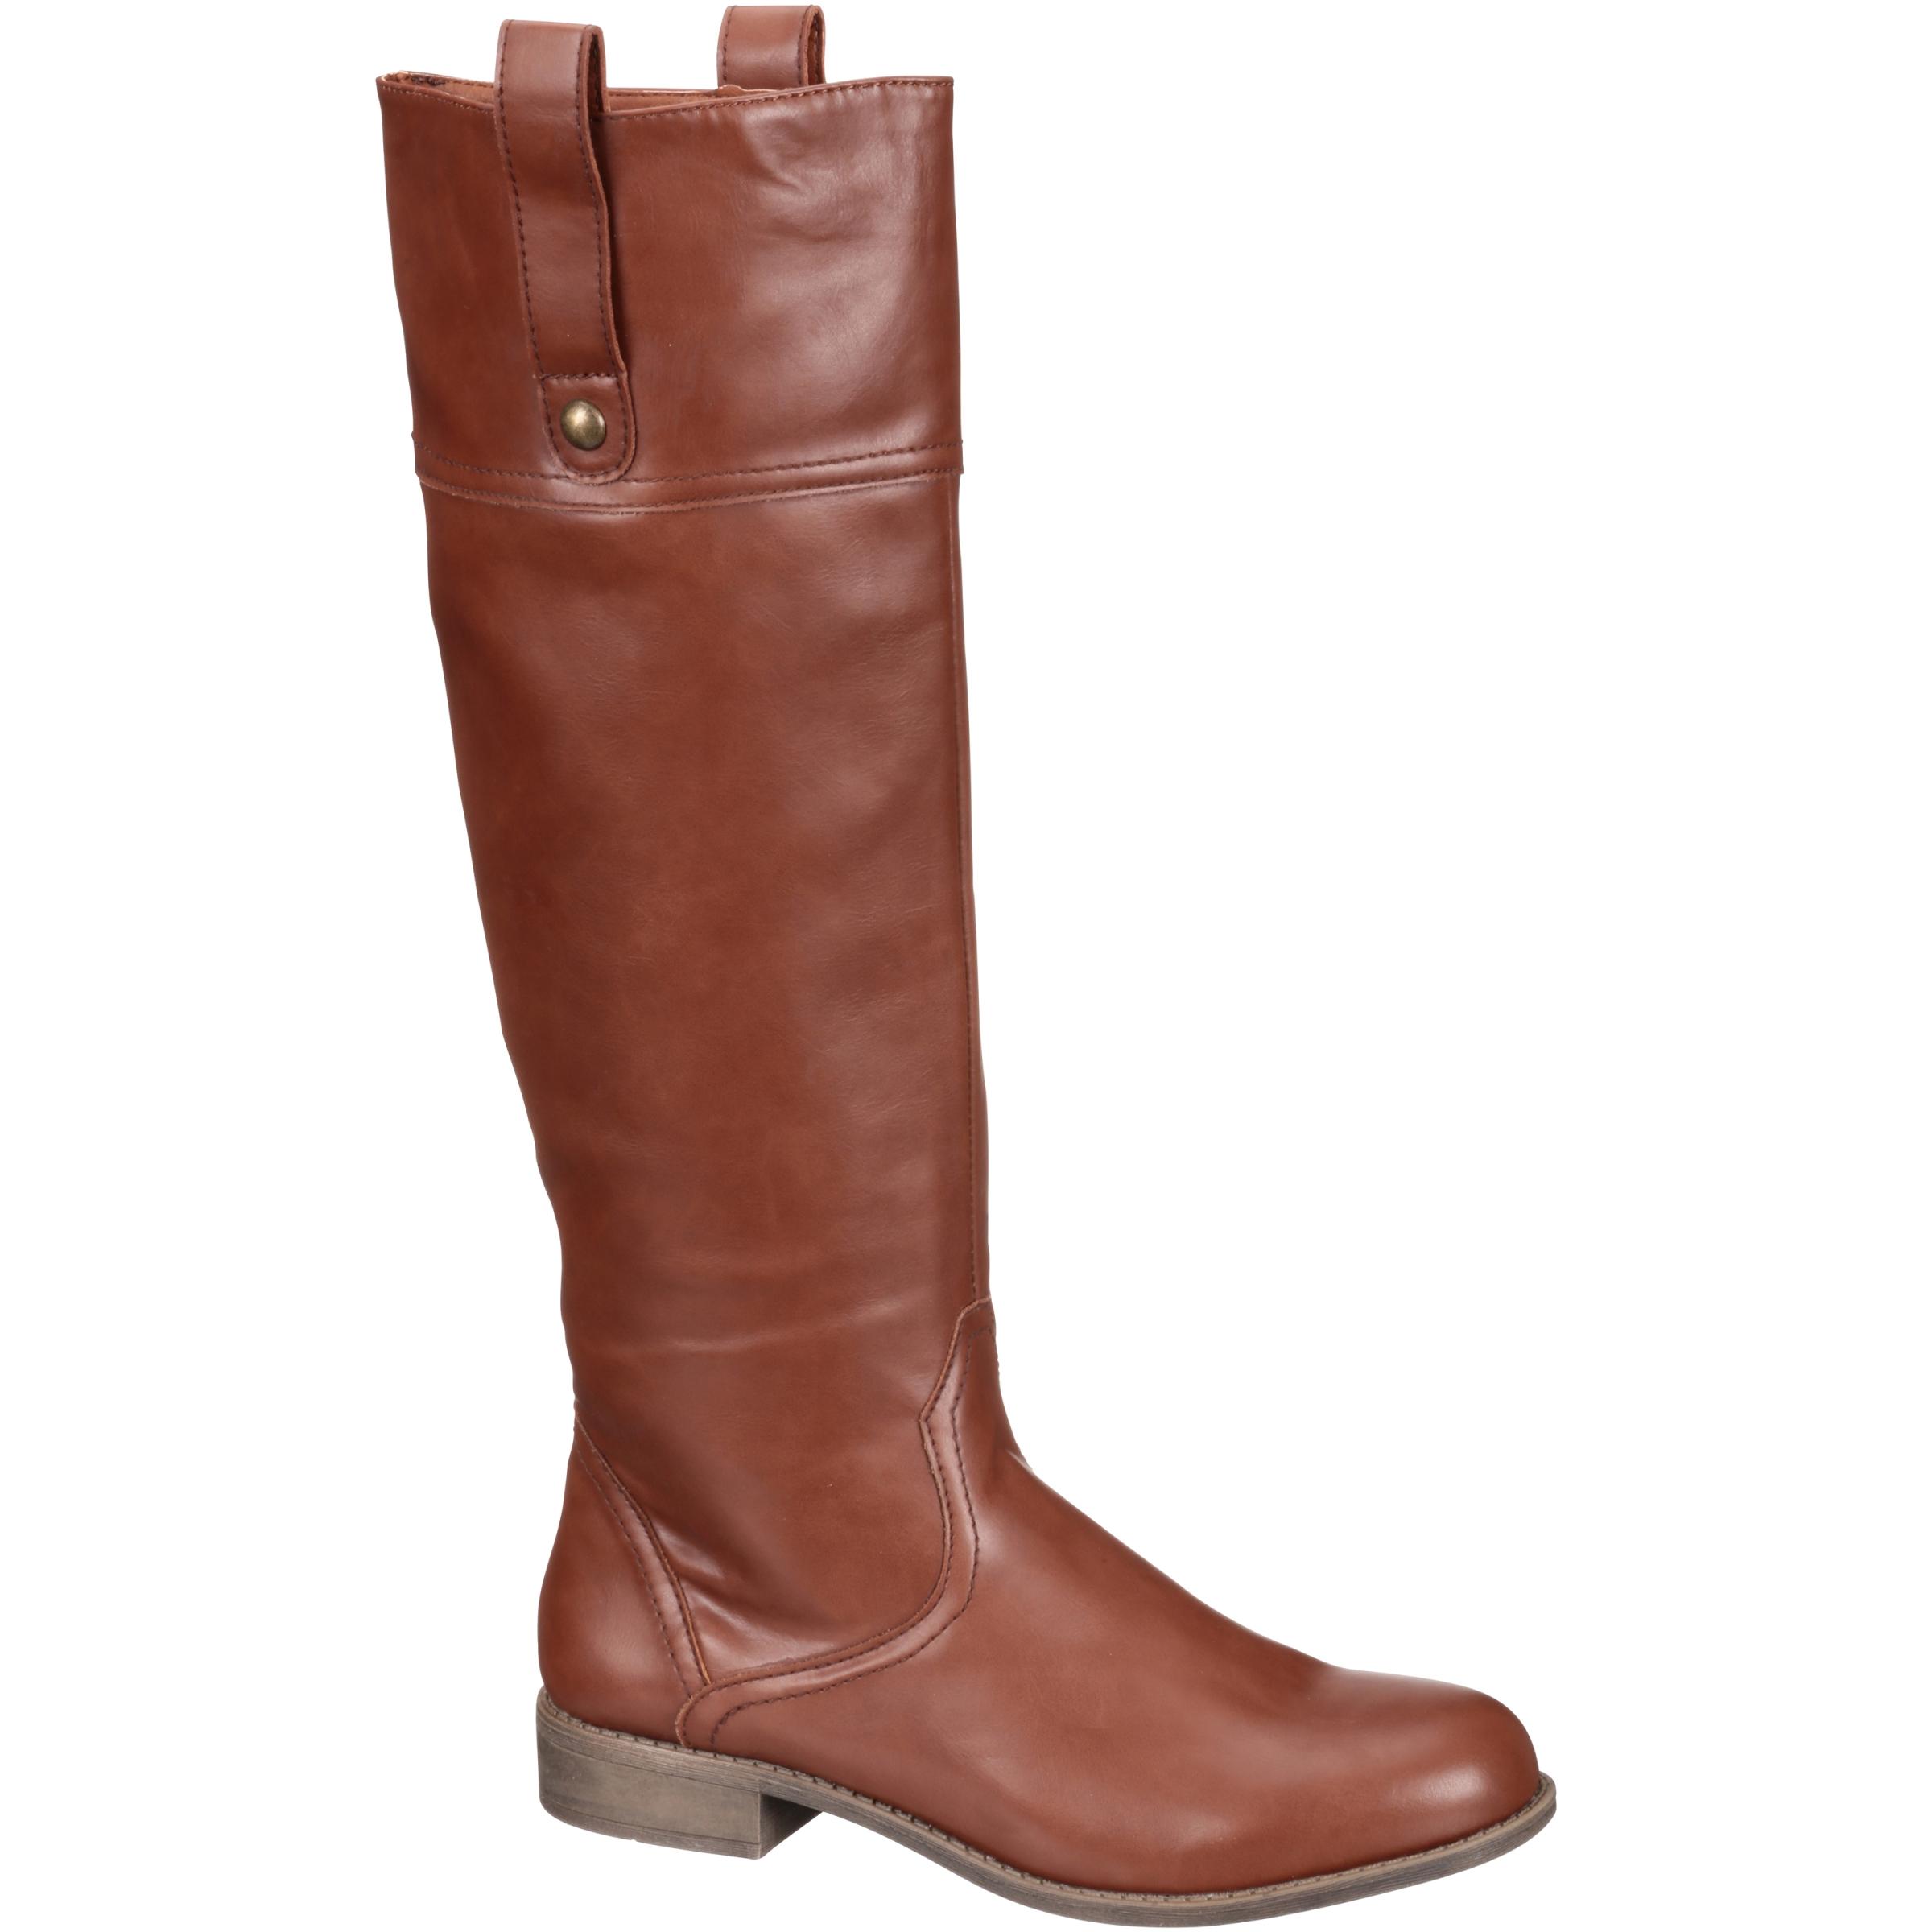 MoMo Women's Alani Boot Shoe Size: 10